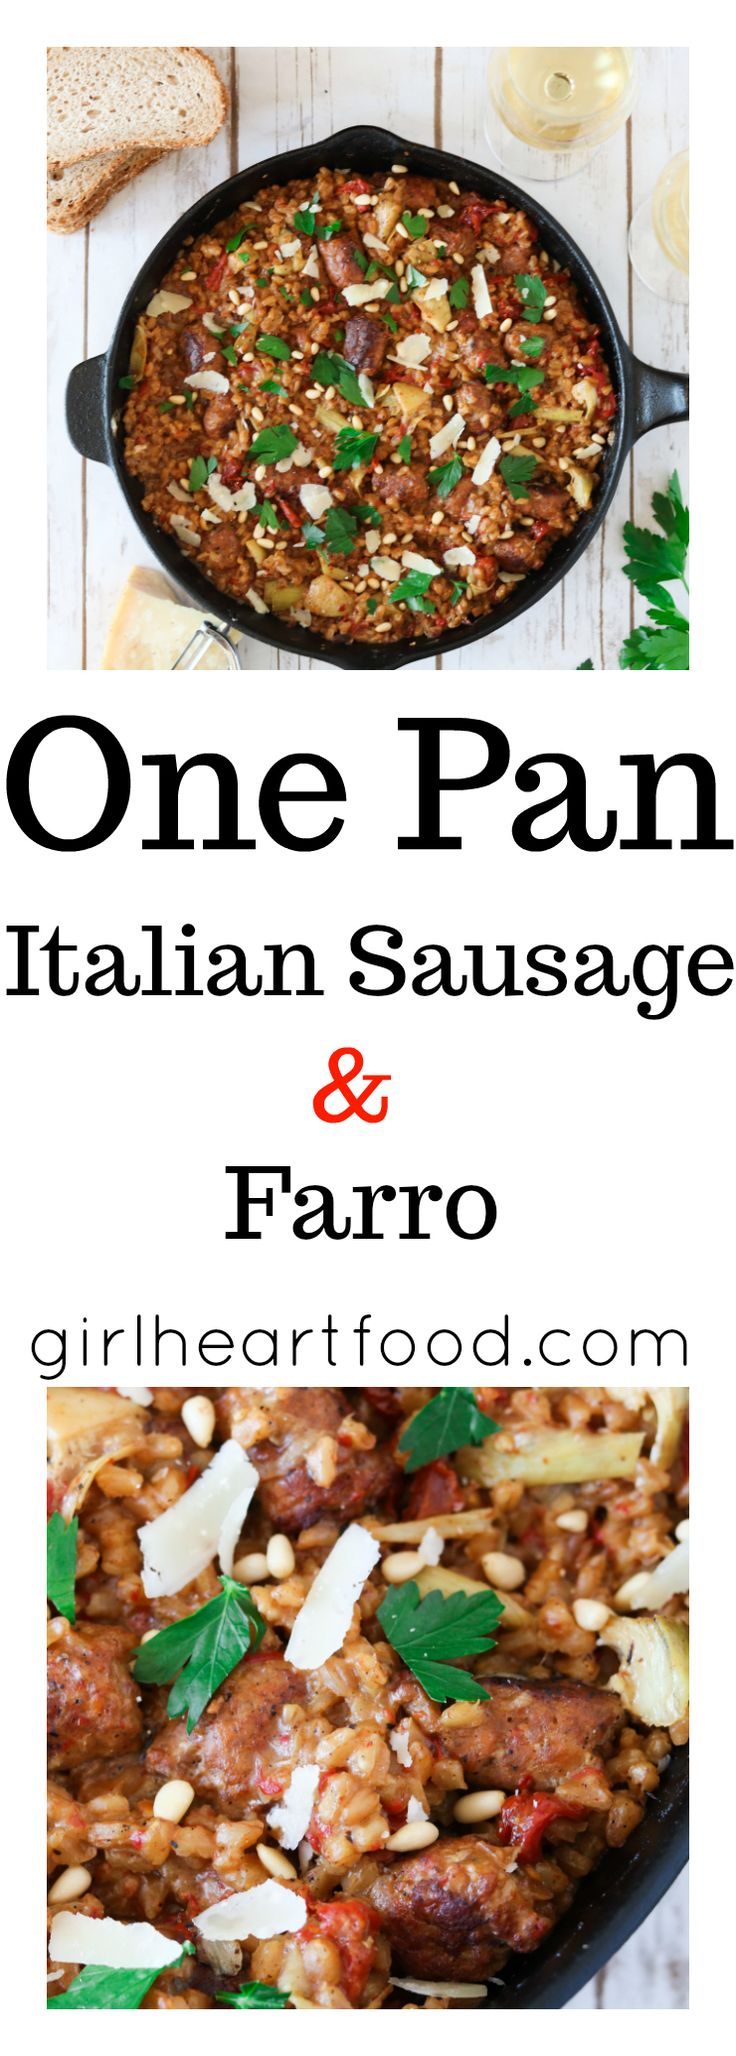 One Pan Italian Sausage and Farro - girlheartfood.com #onepan #onepot #farro #comfortfood